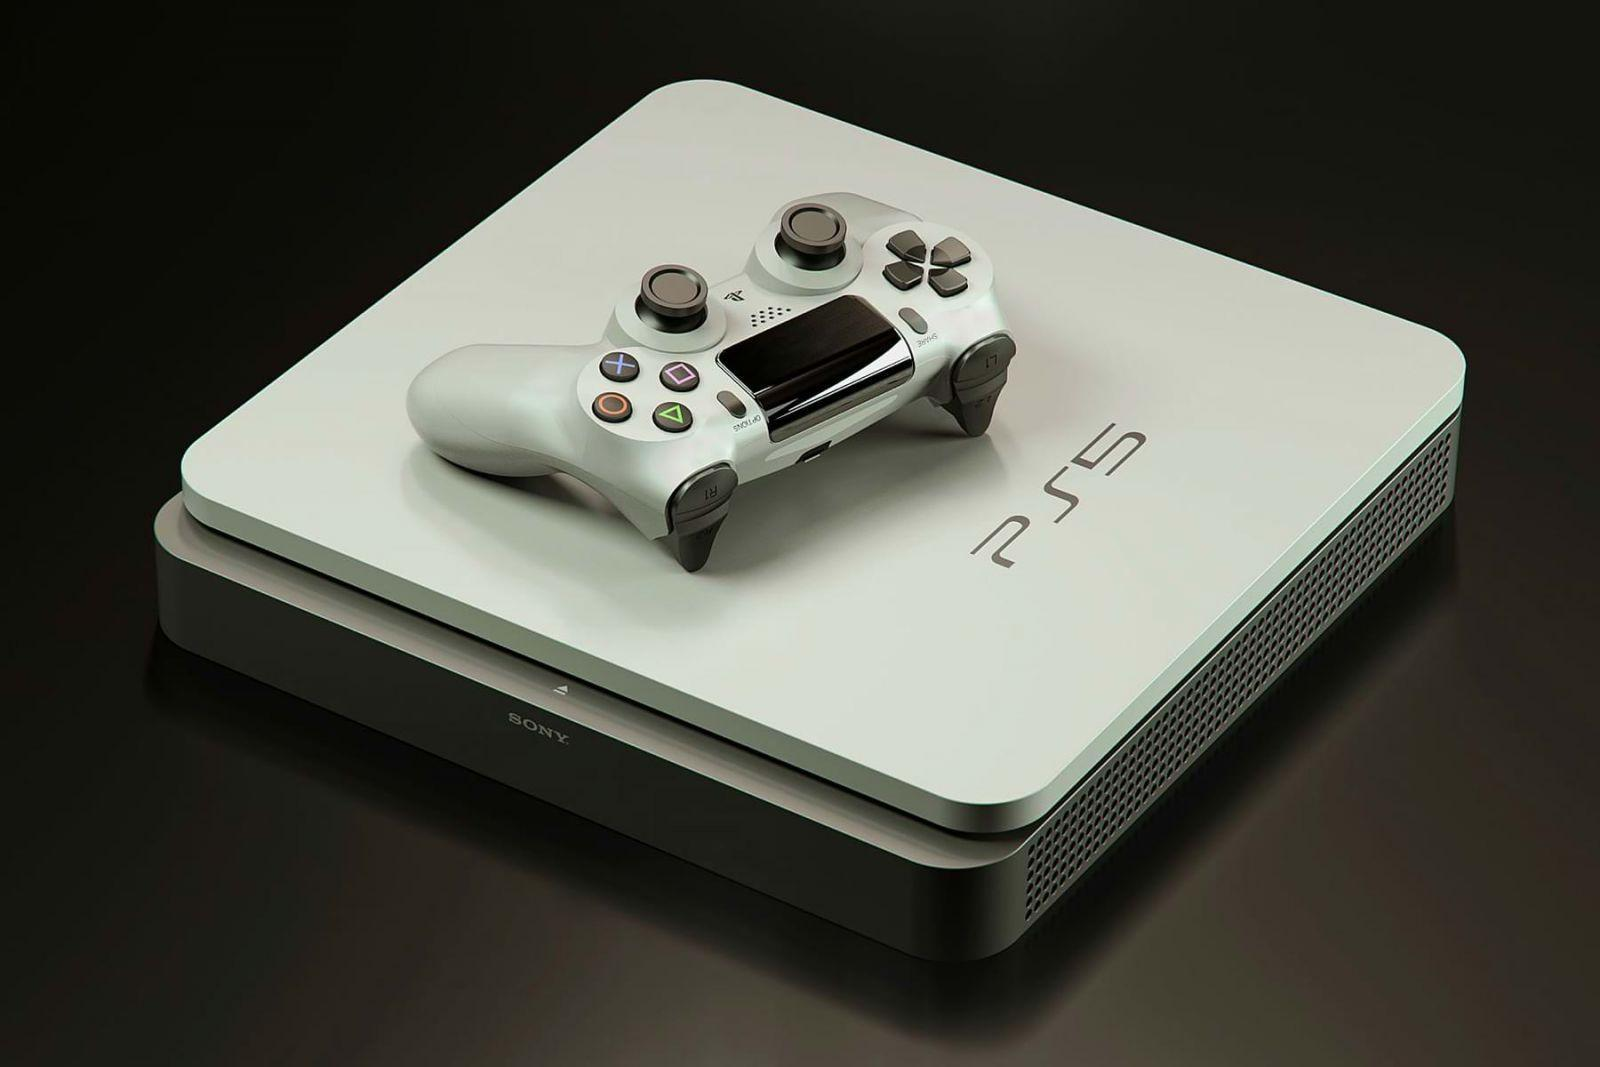 Playstation 5 появилась в Amazon (021bb6e9 353a 466b 83d7 bb0951f47a75)